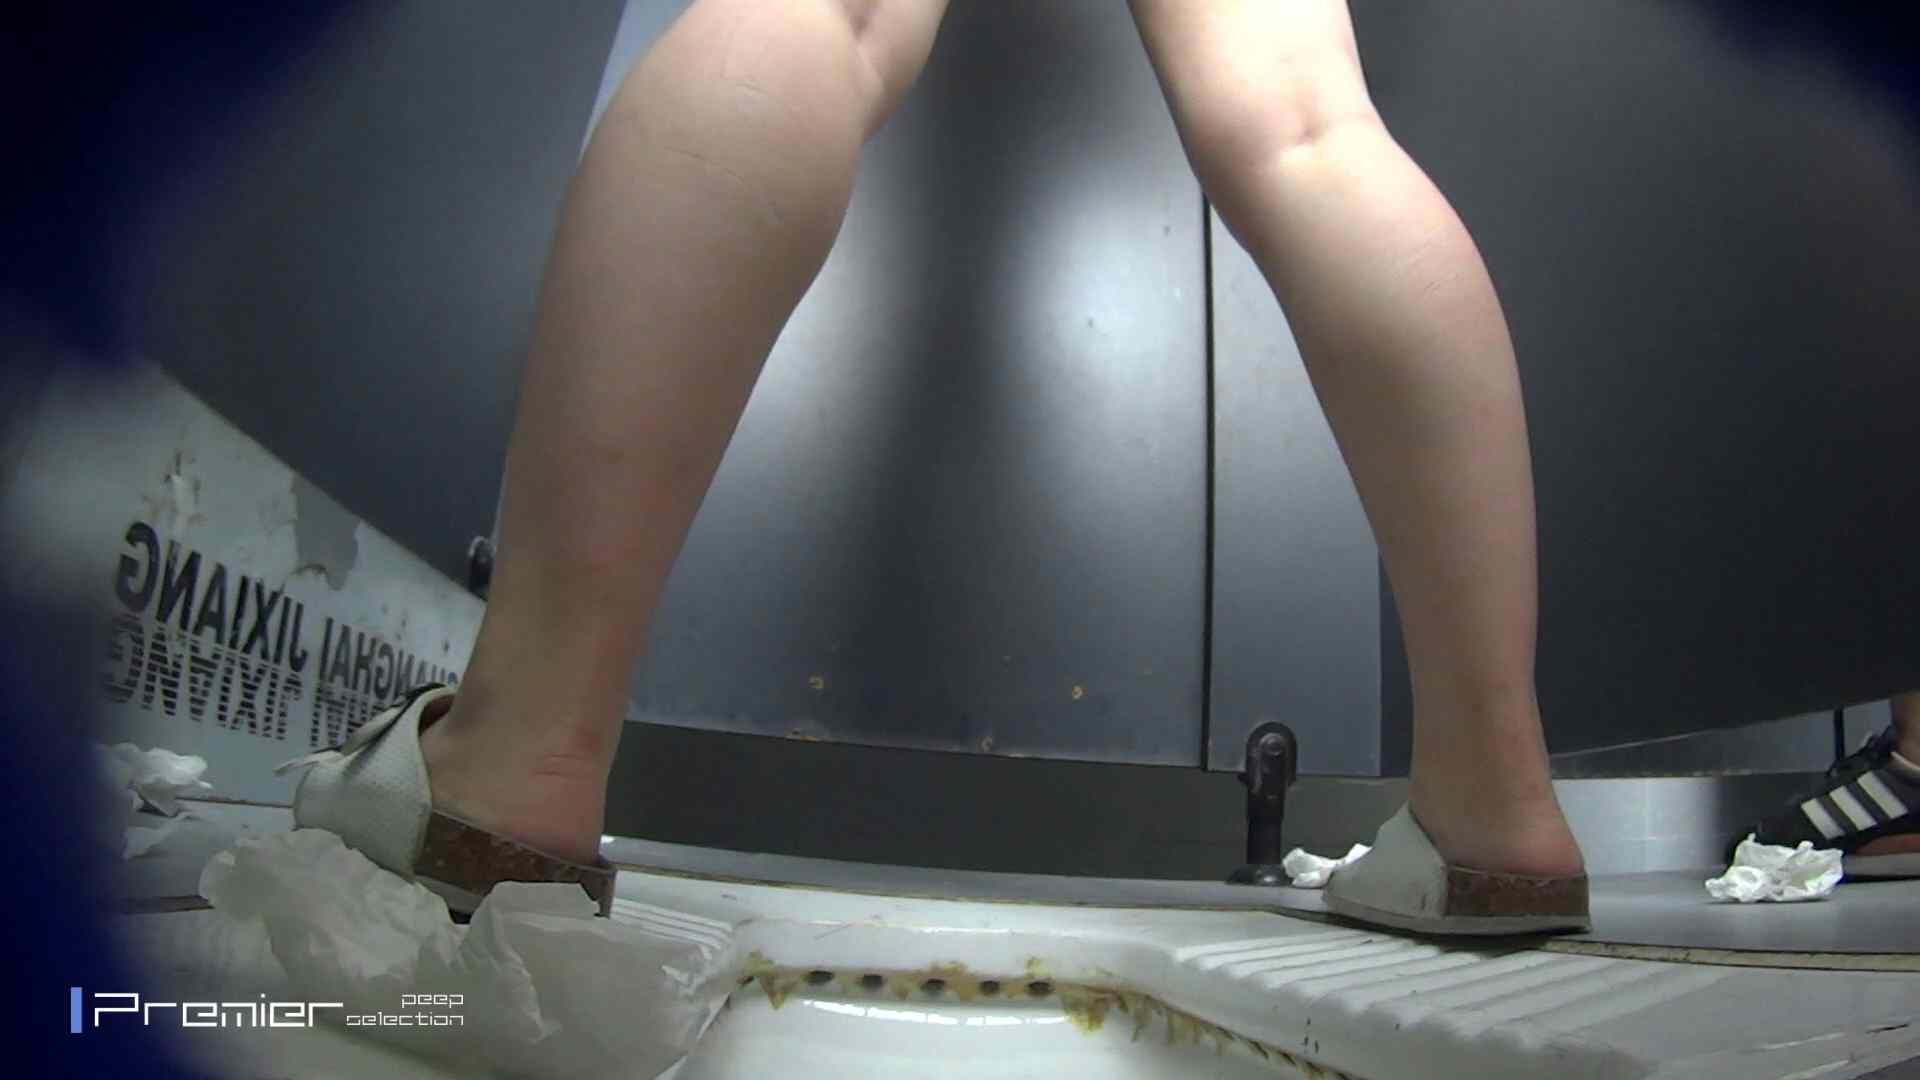 聖水ダラダラ色美女の洗面所 大学休憩時間の洗面所事情55 細身体型  99枚 22